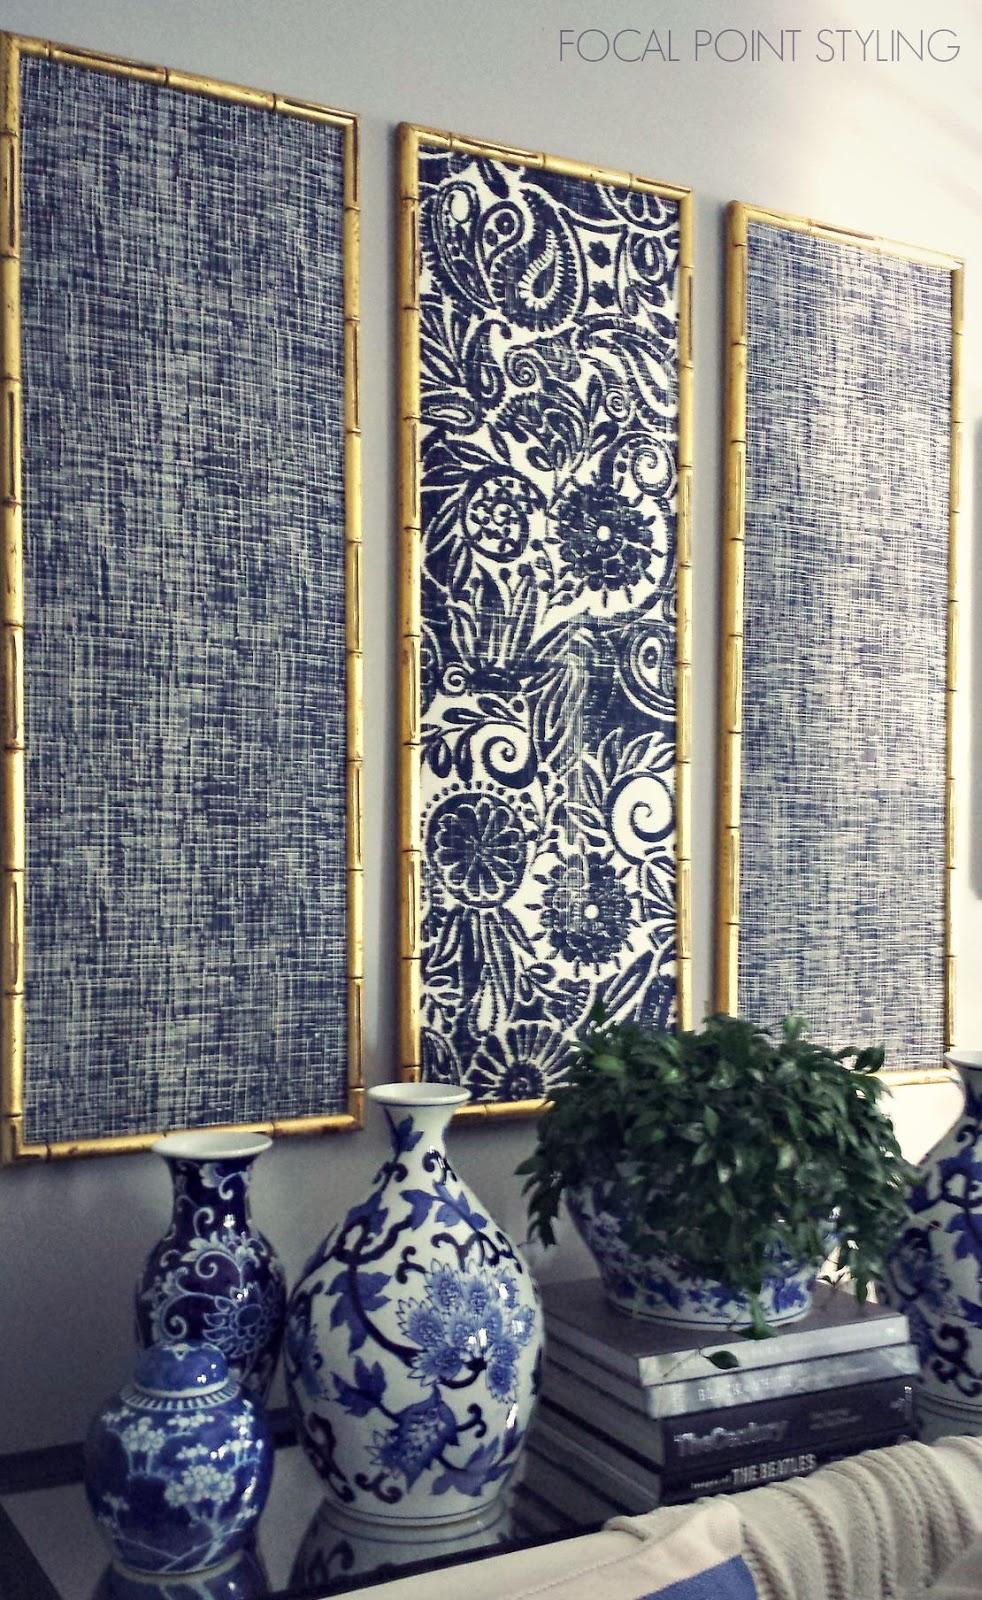 FOCAL POINT STYLING: DIY Indigo Wall Art With Framed Fabric